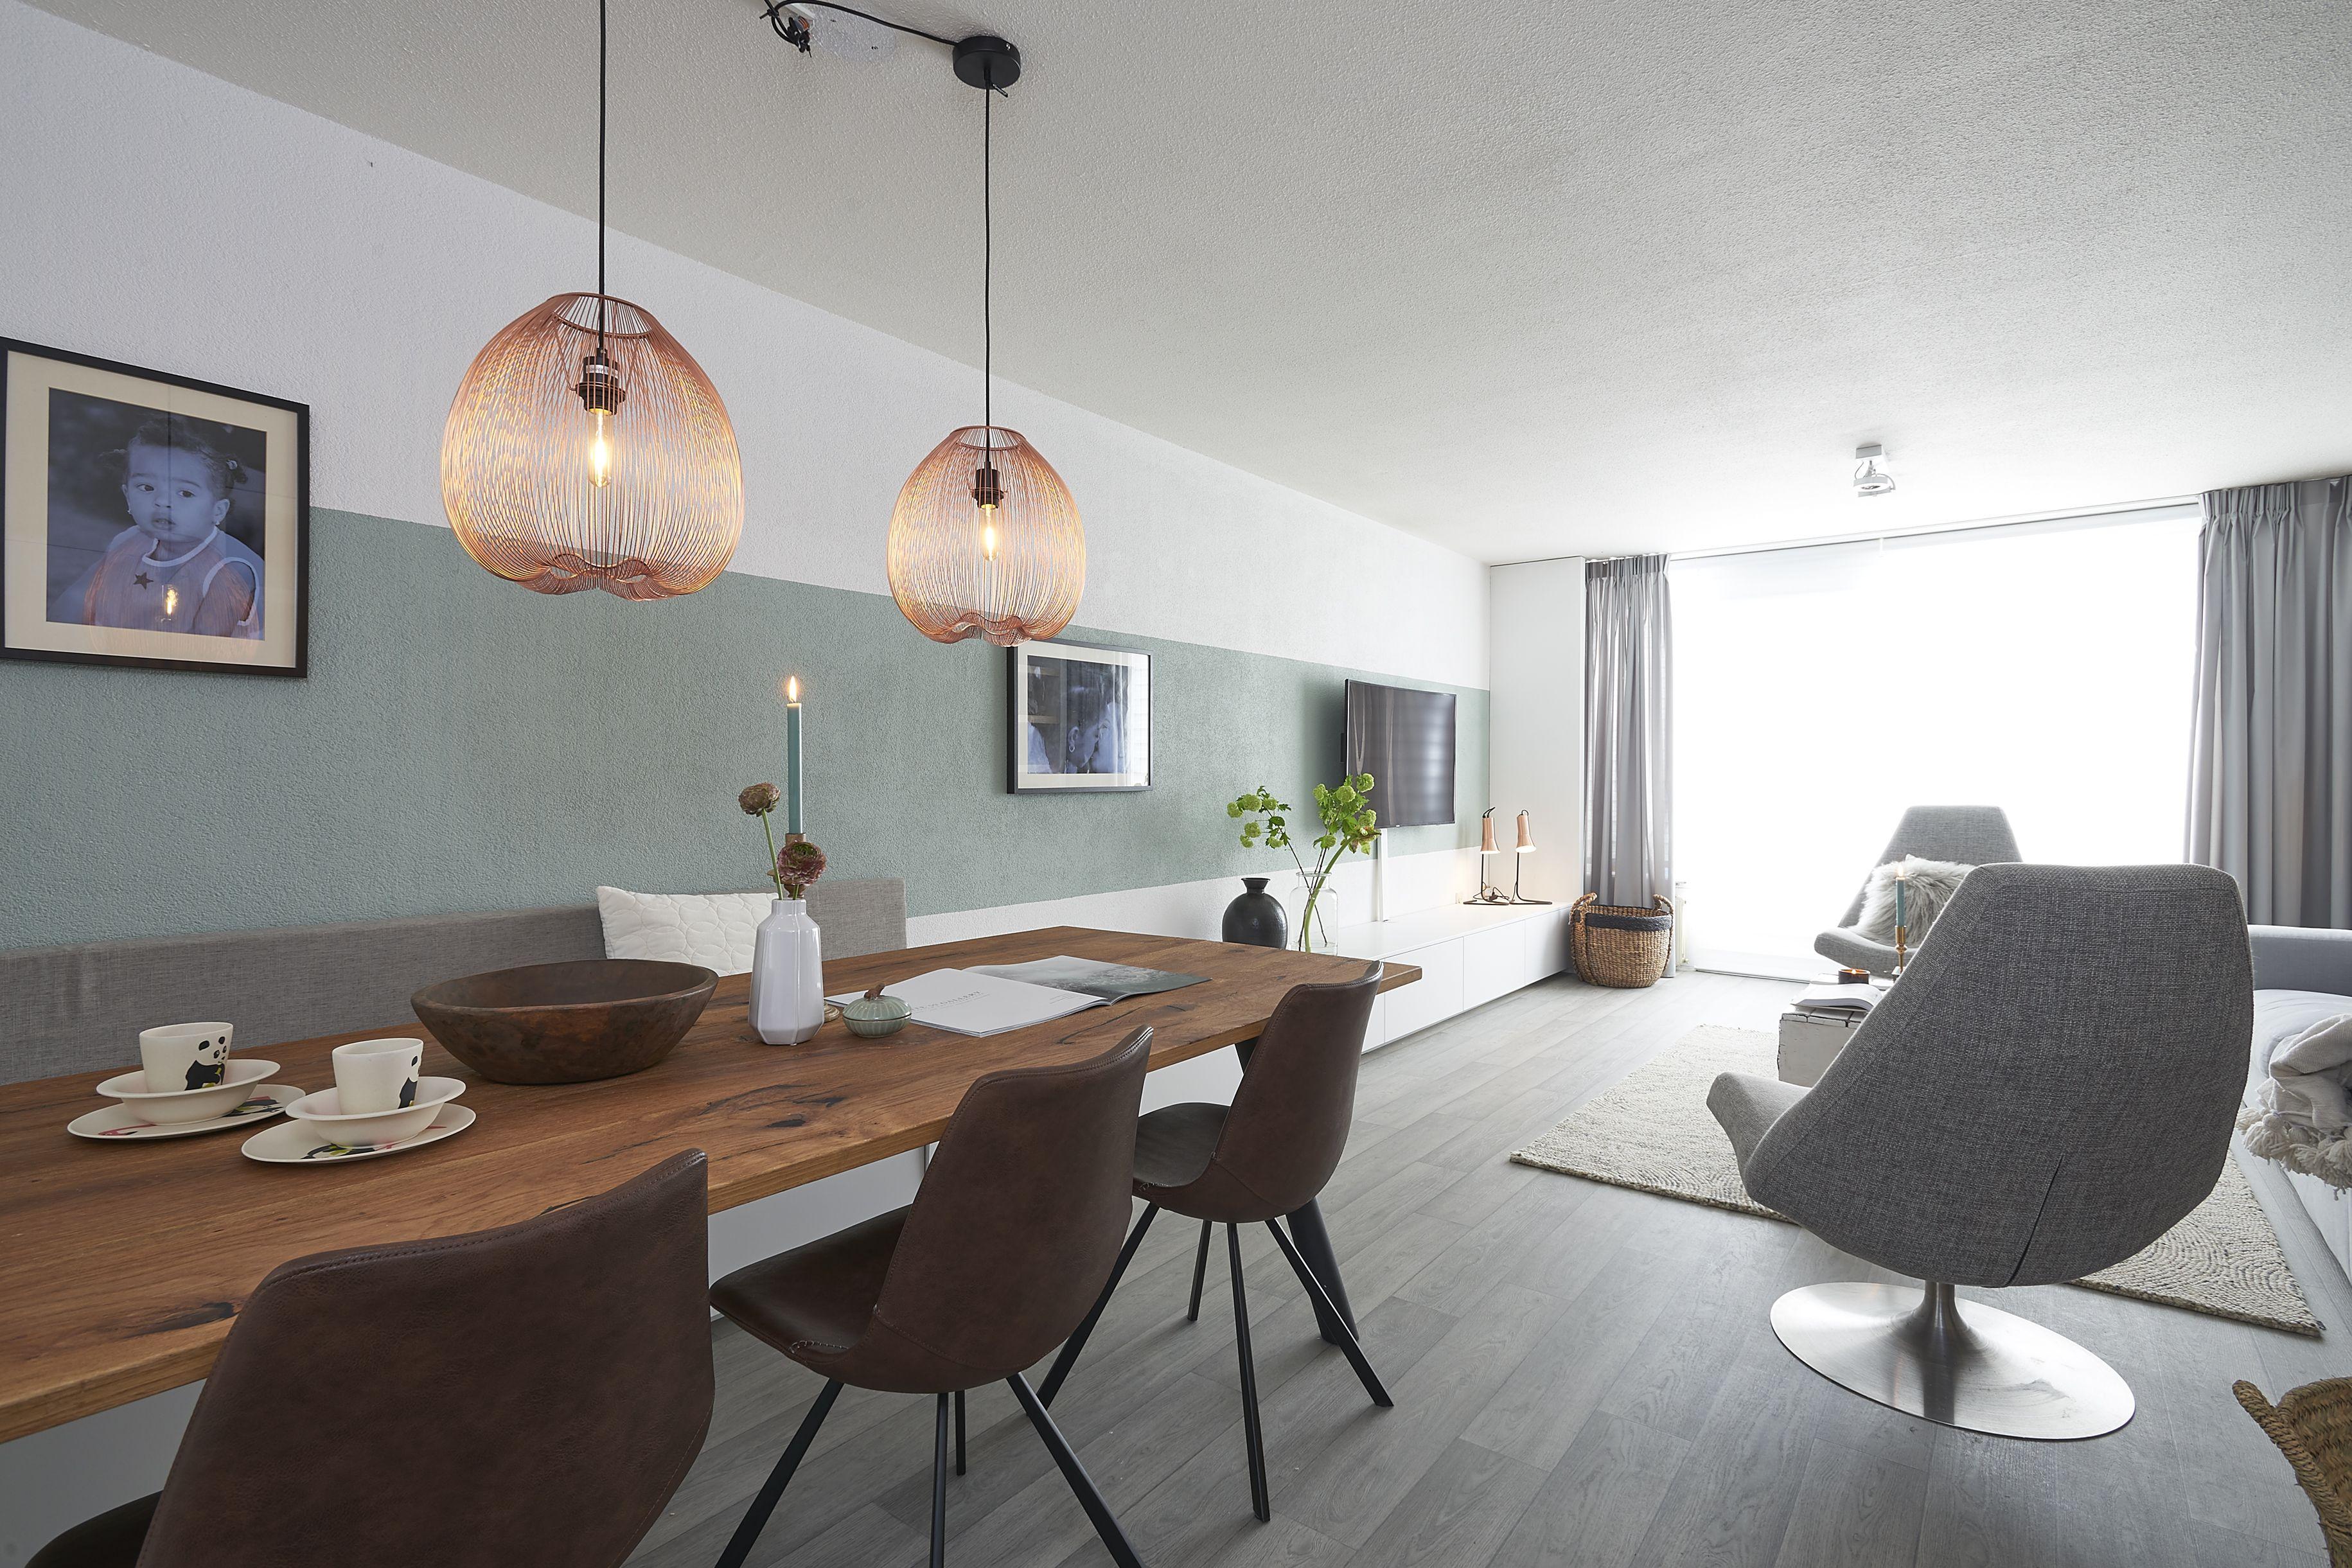 pingl par inge vervoordeldonk sur huis pinterest deco appartement fauteuil et appartement. Black Bedroom Furniture Sets. Home Design Ideas